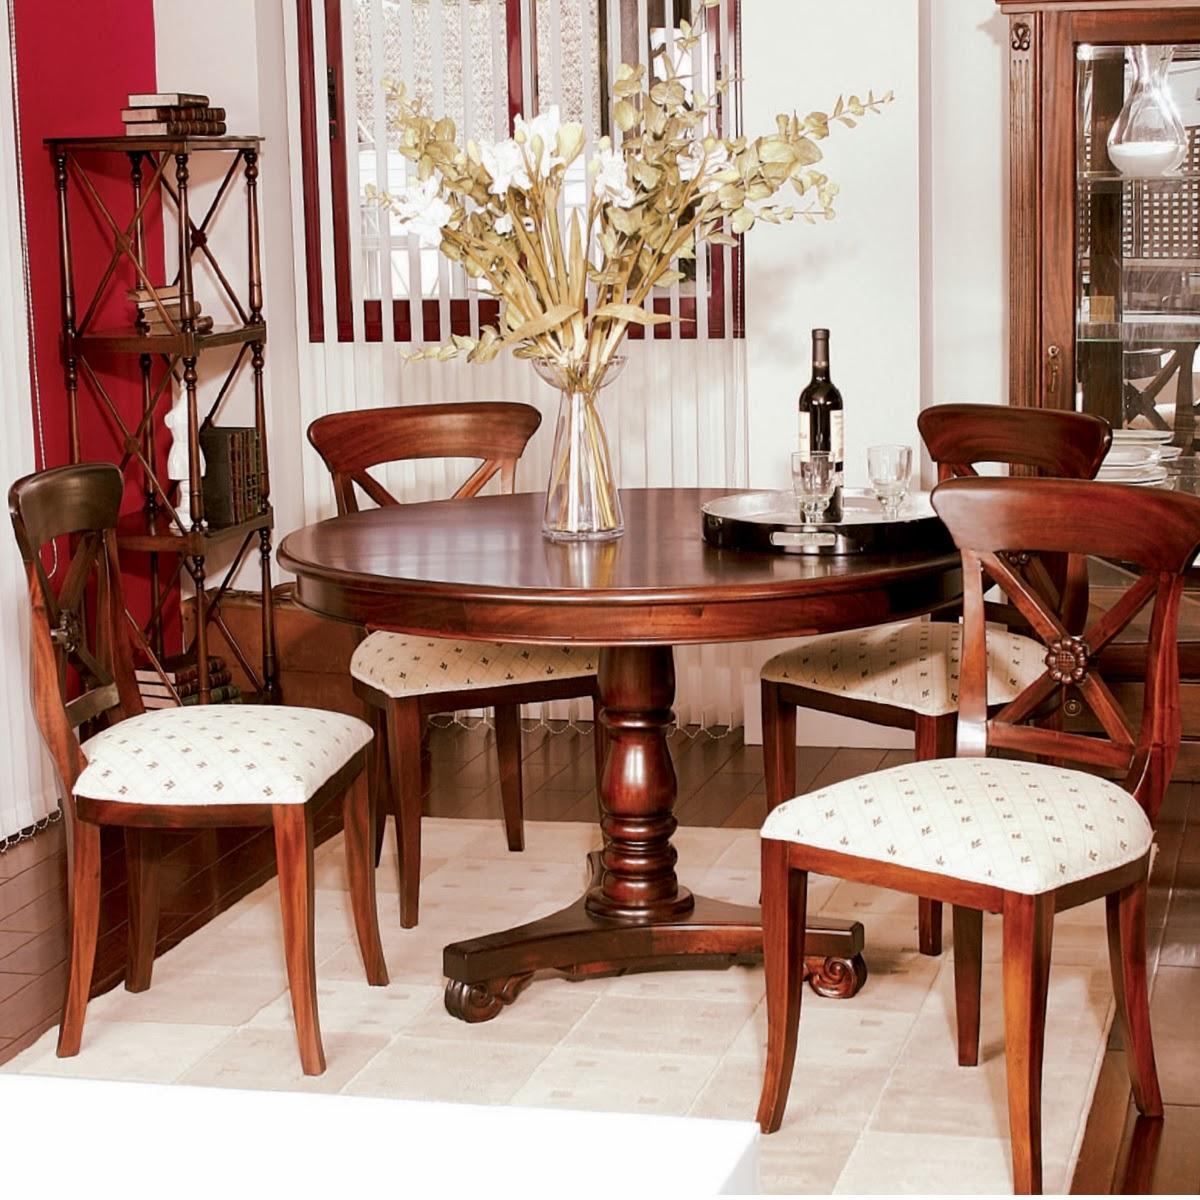 Muebles de comedor 5 comedores clasicos en caoba for Comedores en madera